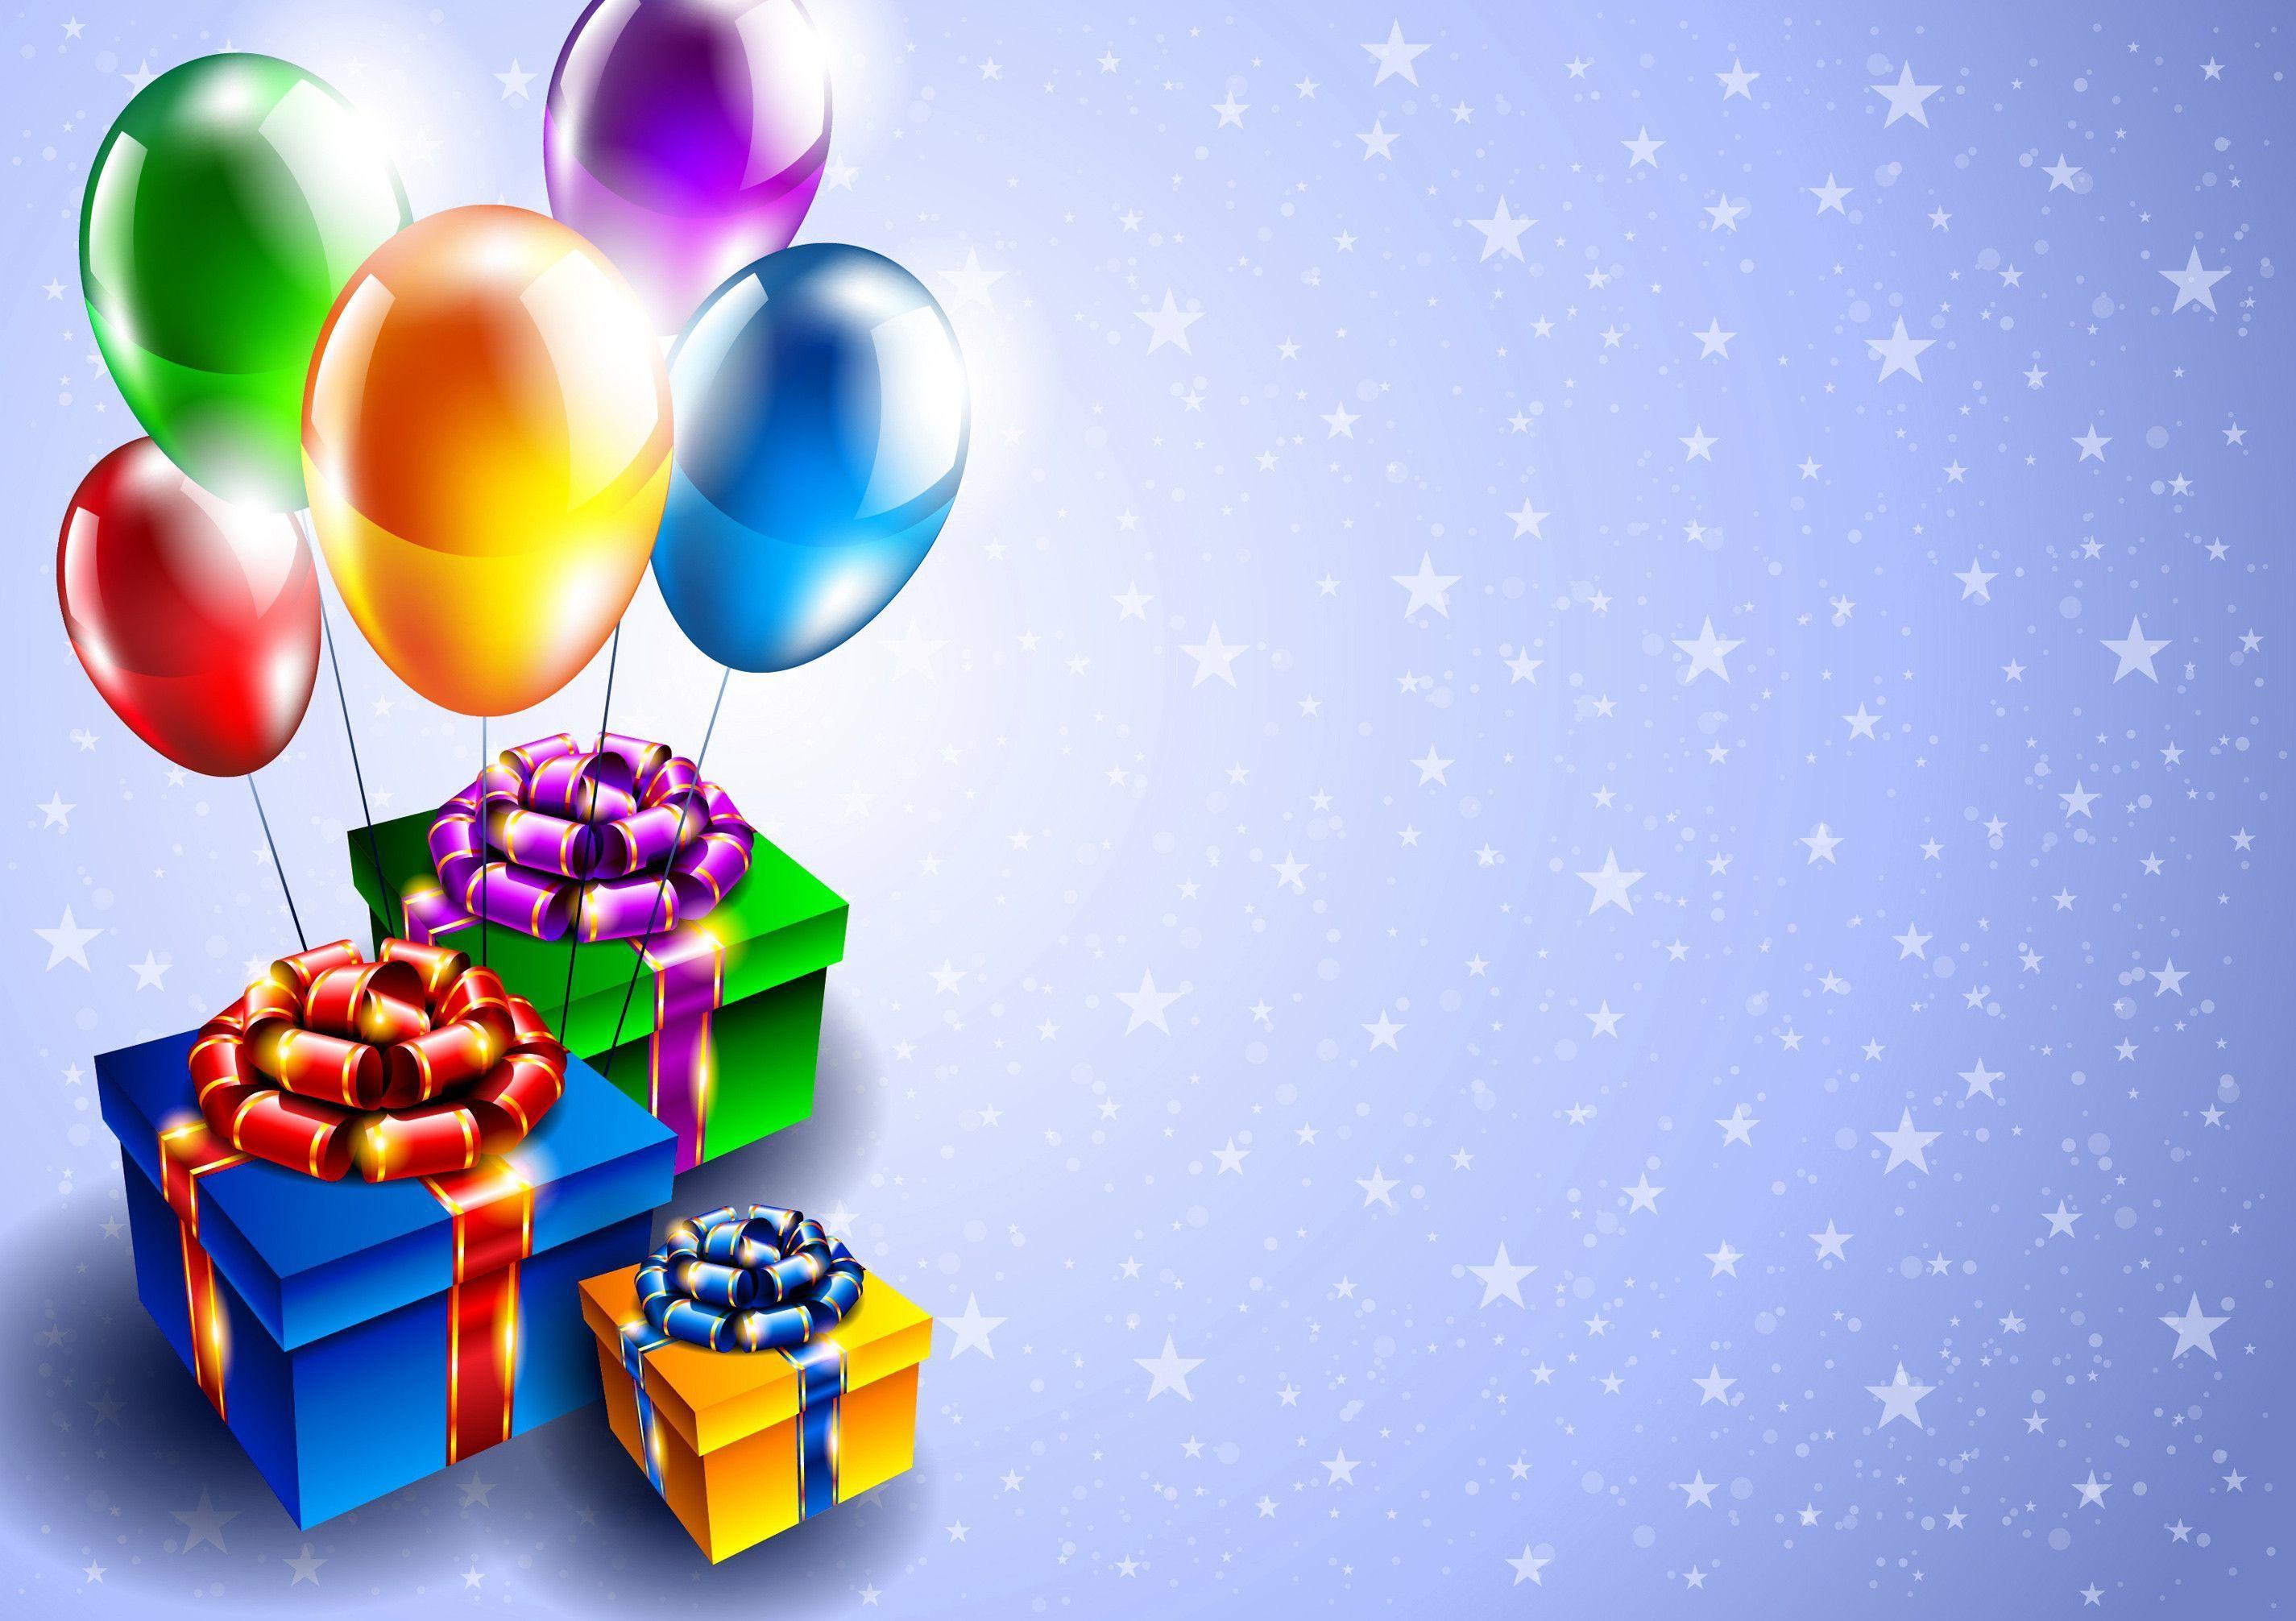 colorful balloons image hd